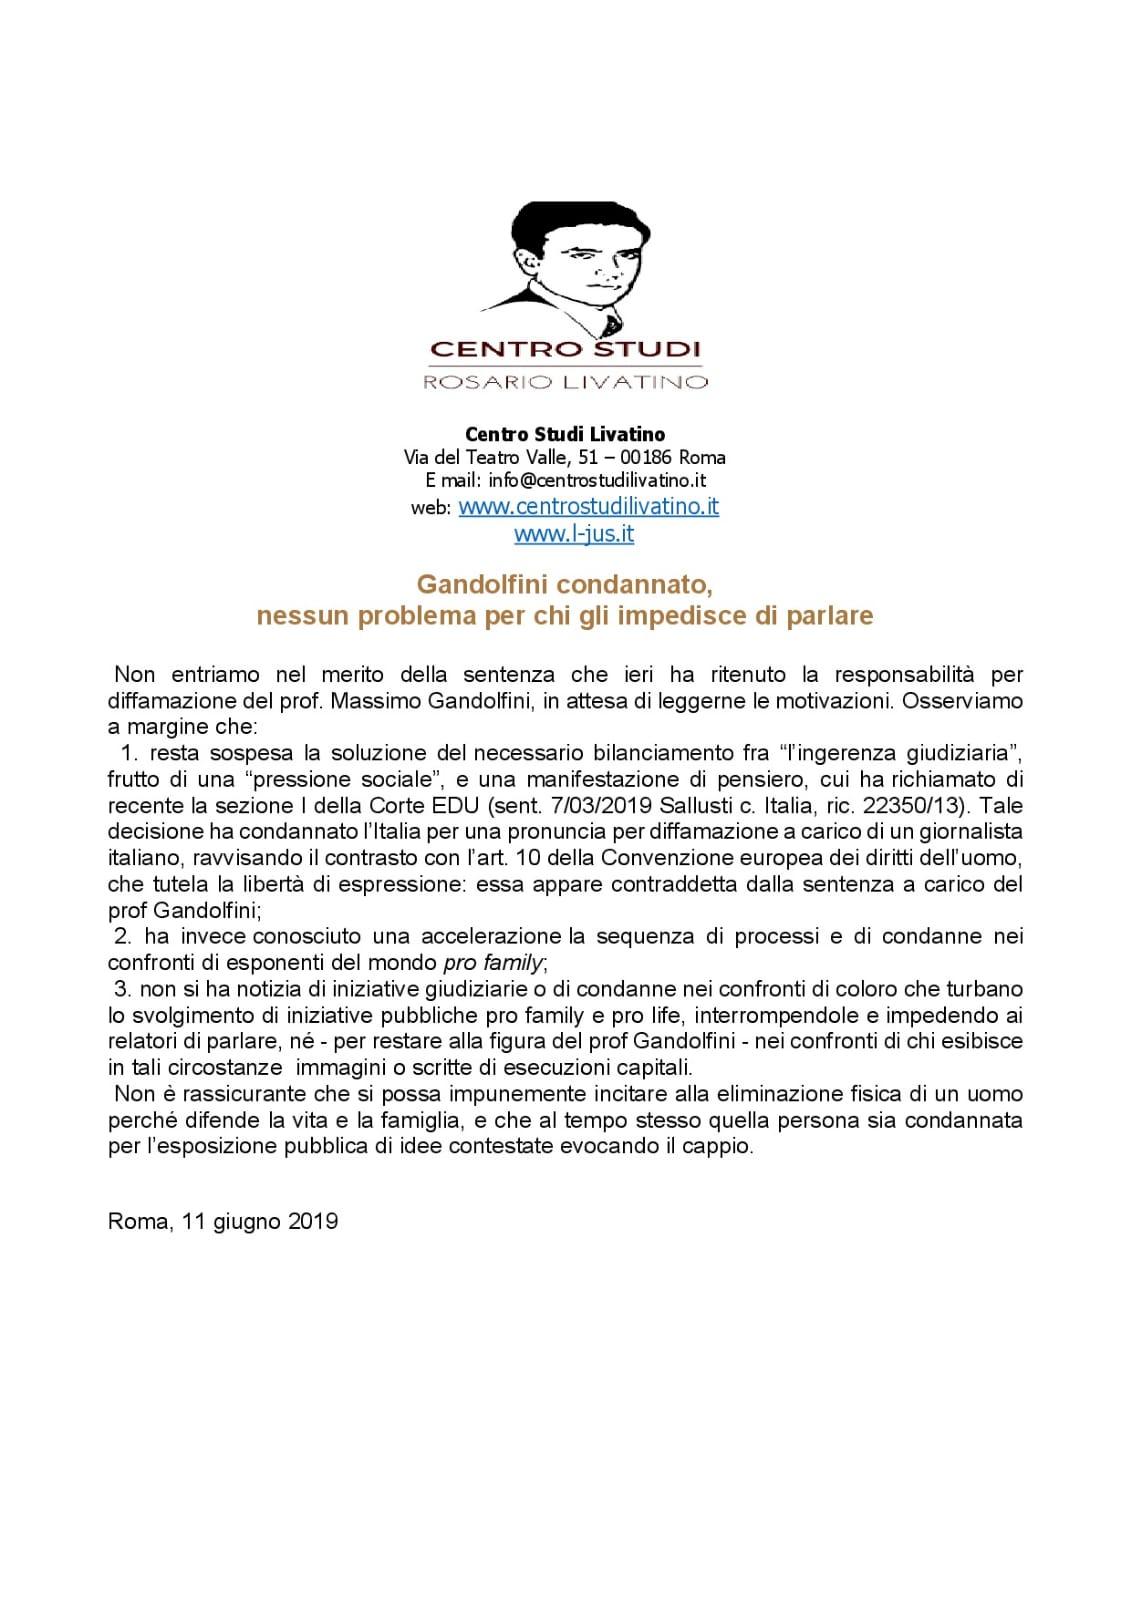 2019.06.11_nota-CS-Livatino-su-condanna-Gandolfini.jpeg